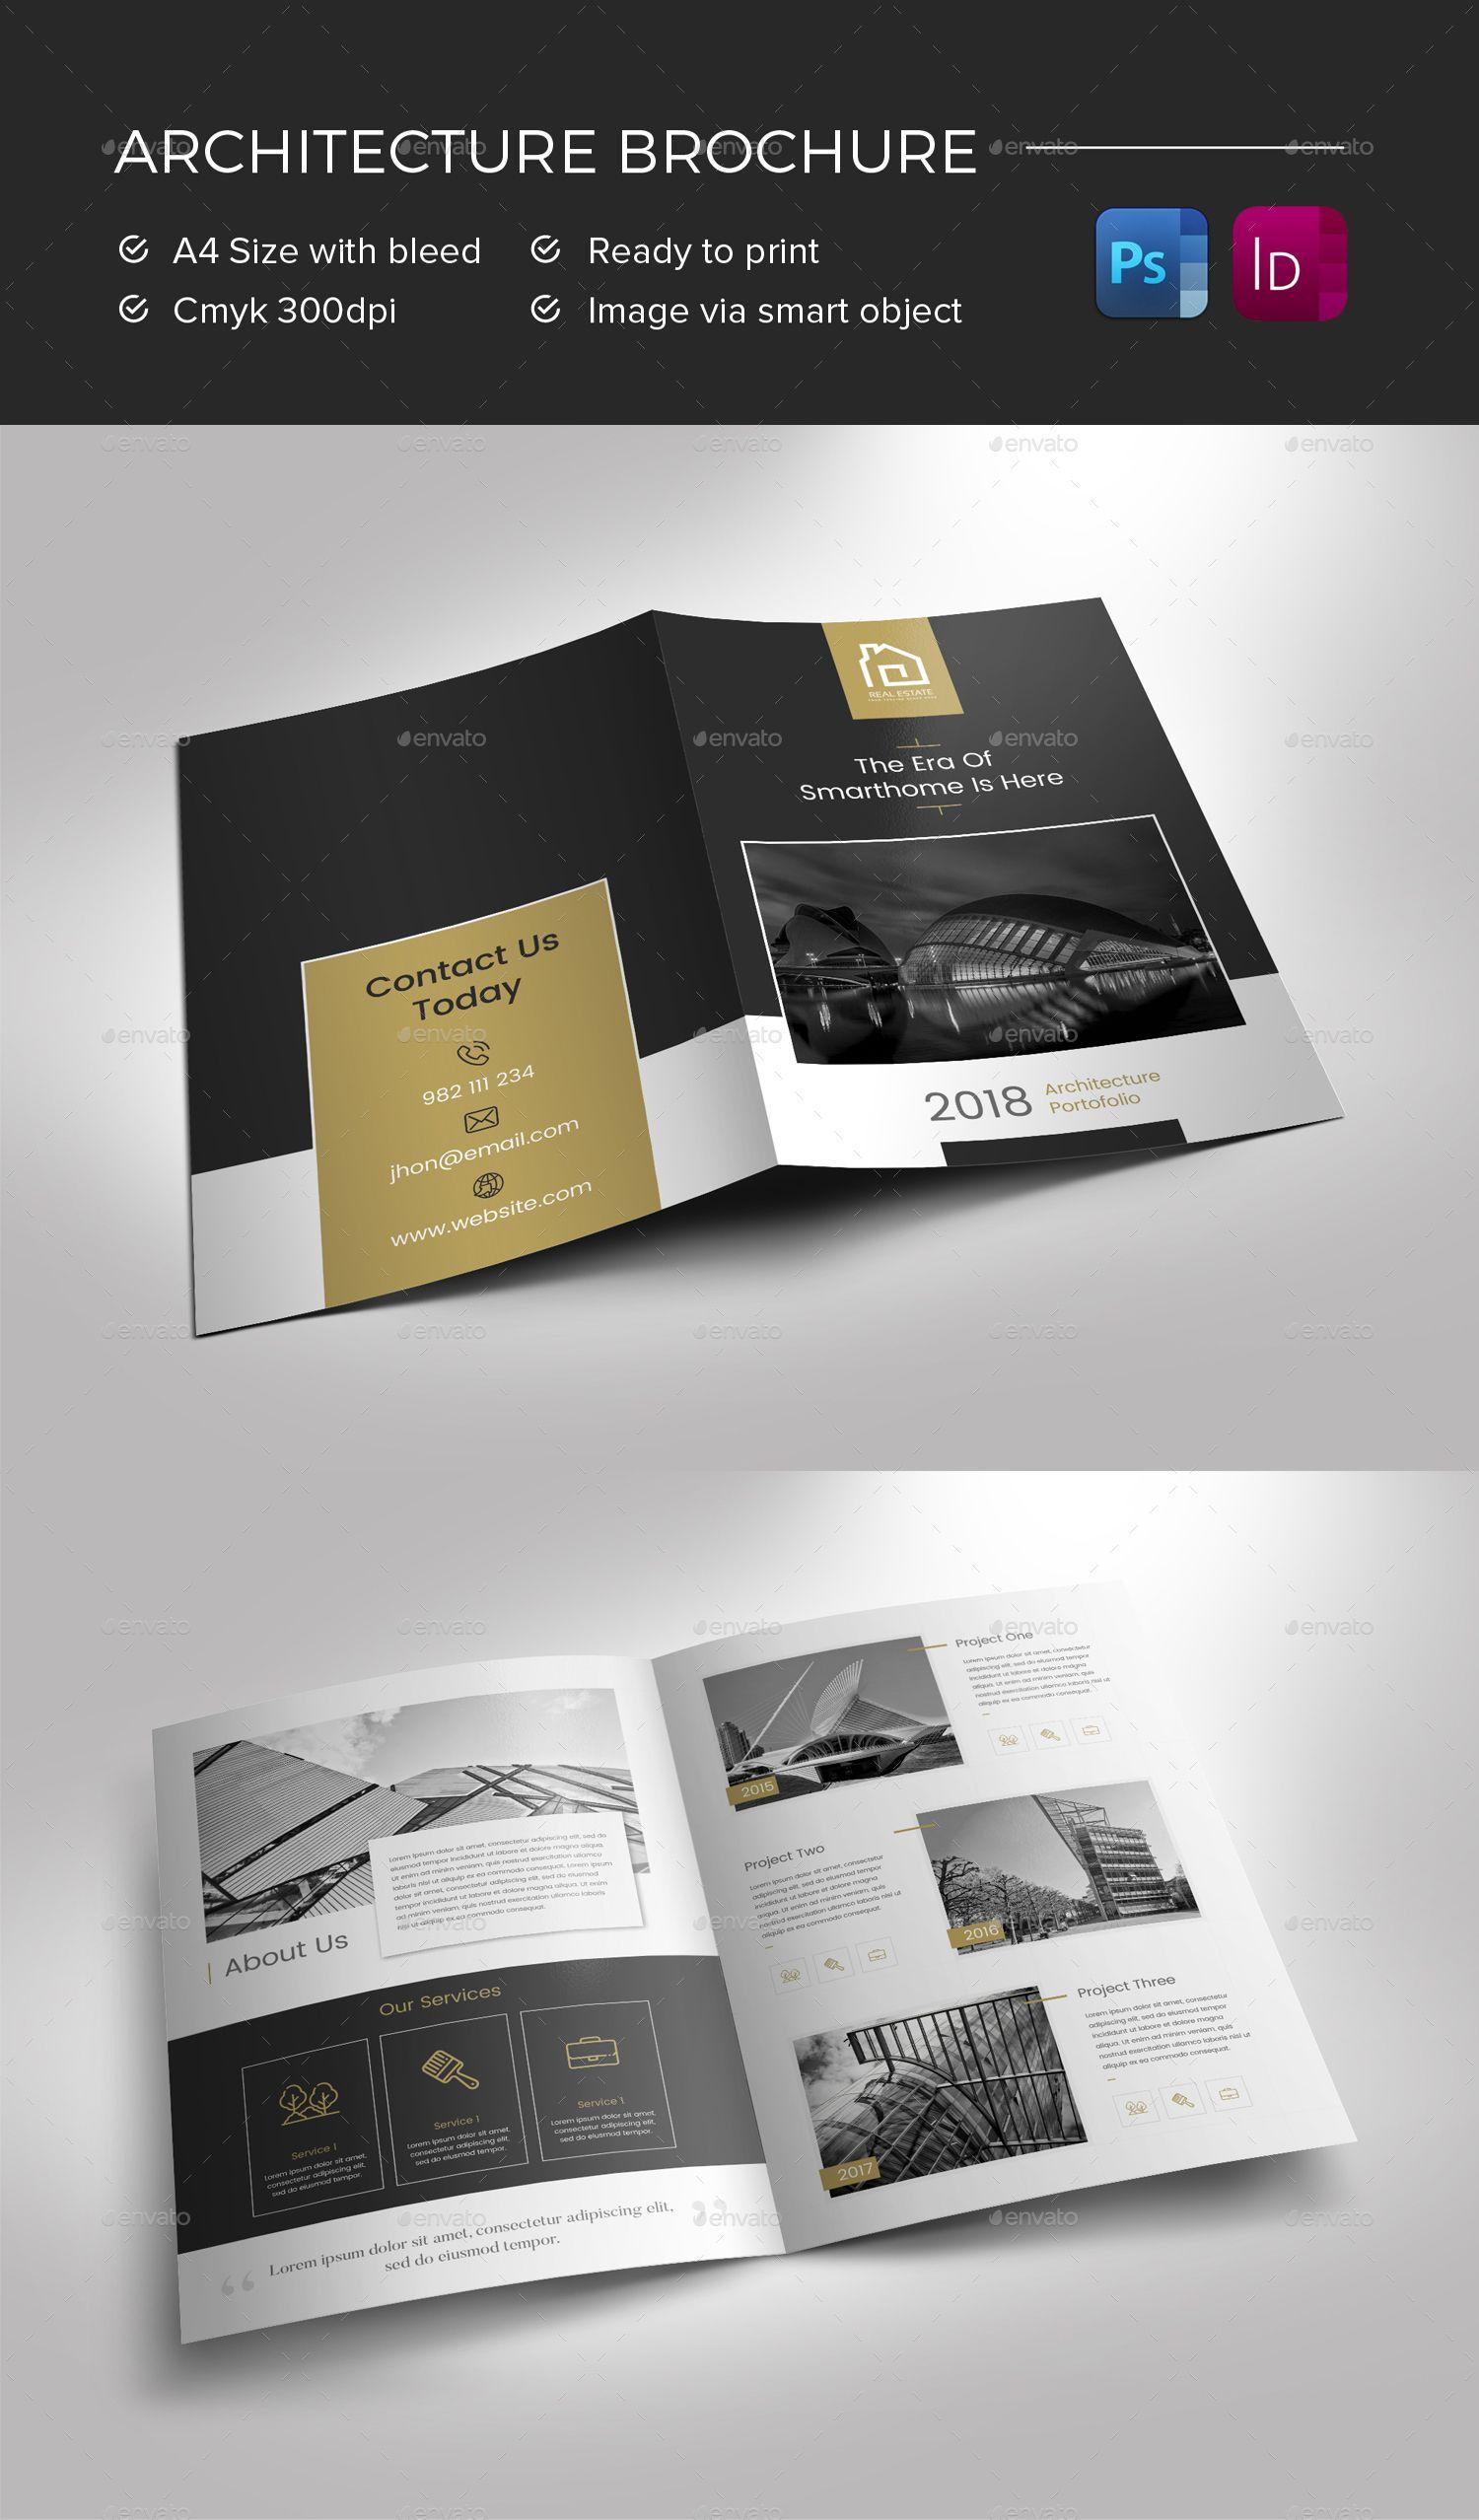 Architecture Brochure Preview – Graphicriver | Brochure Intended For Architecture Brochure Templates Free Download